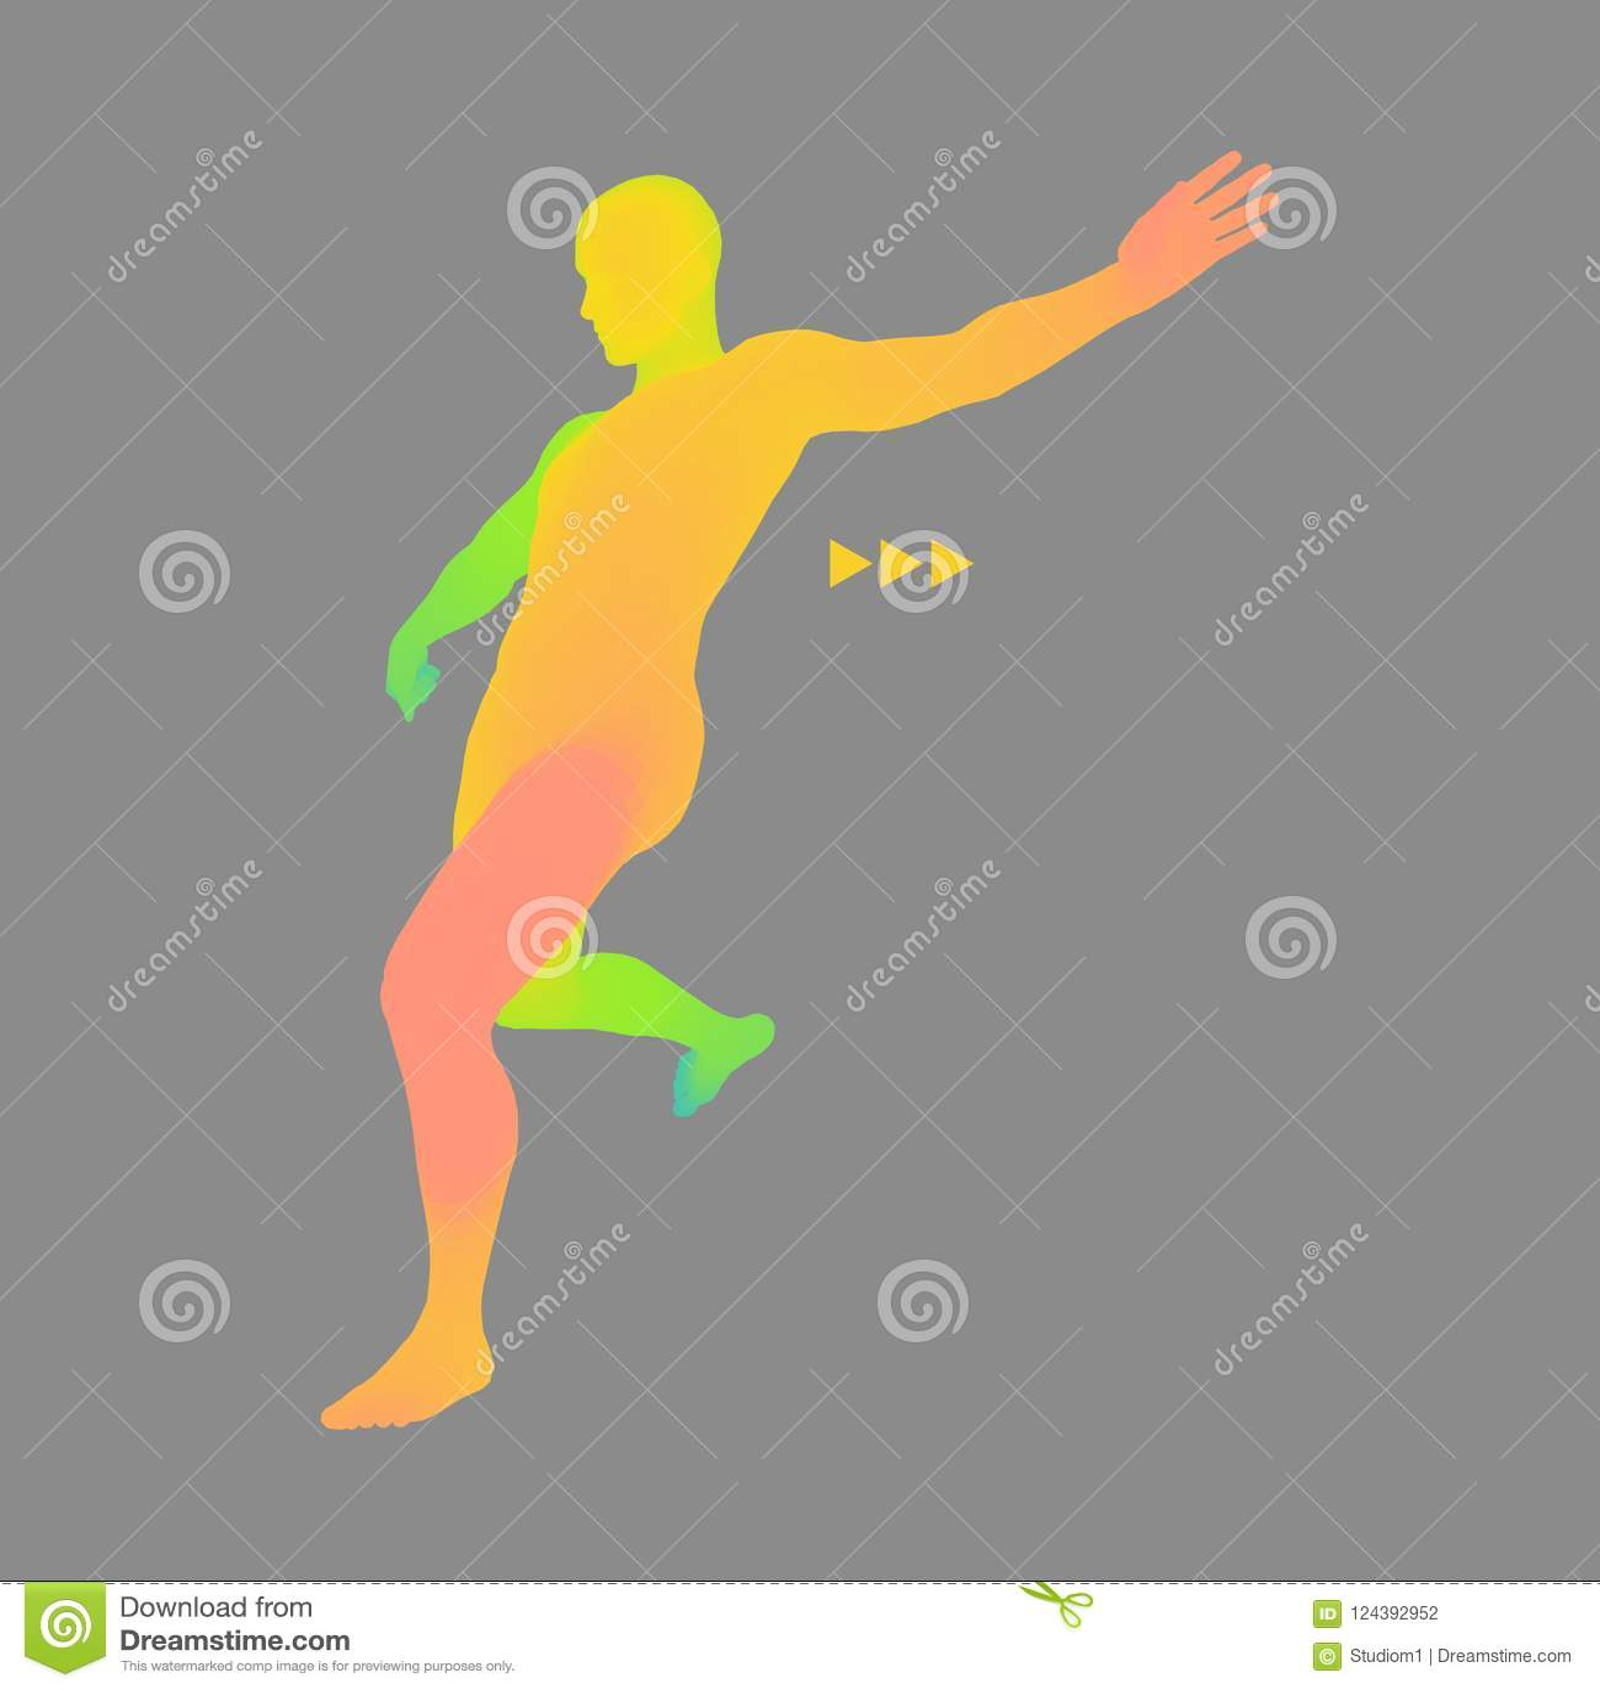 Football Player  Sports Concept  3D Model Of Man  Human Body  Sport